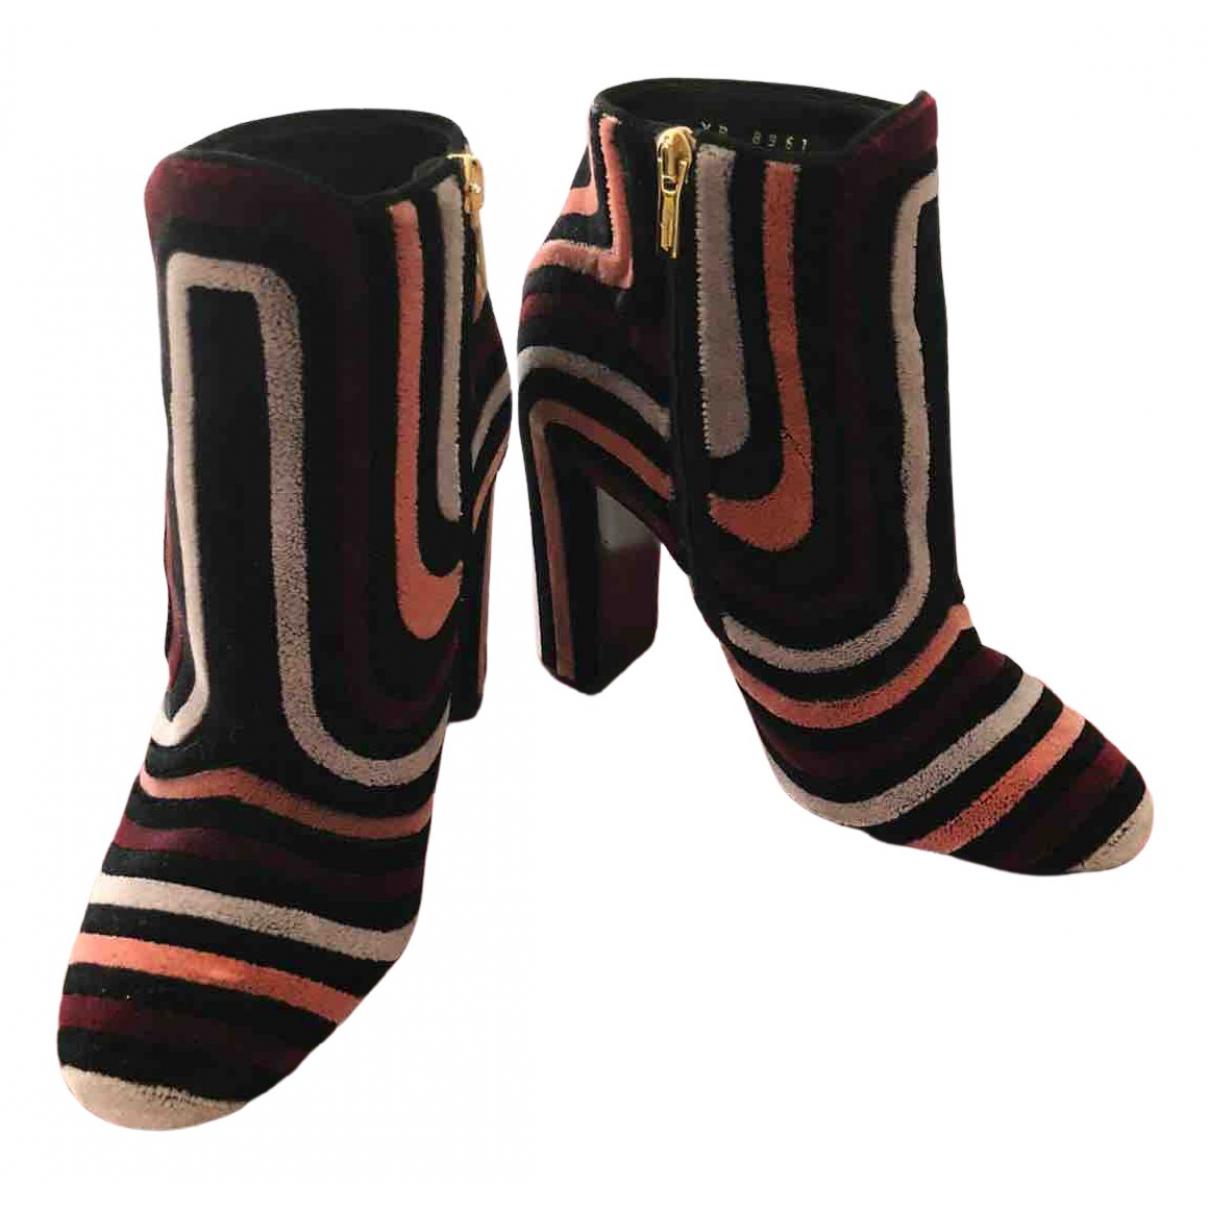 Salvatore Ferragamo N Multicolour Velvet Ankle boots for Women 37 EU